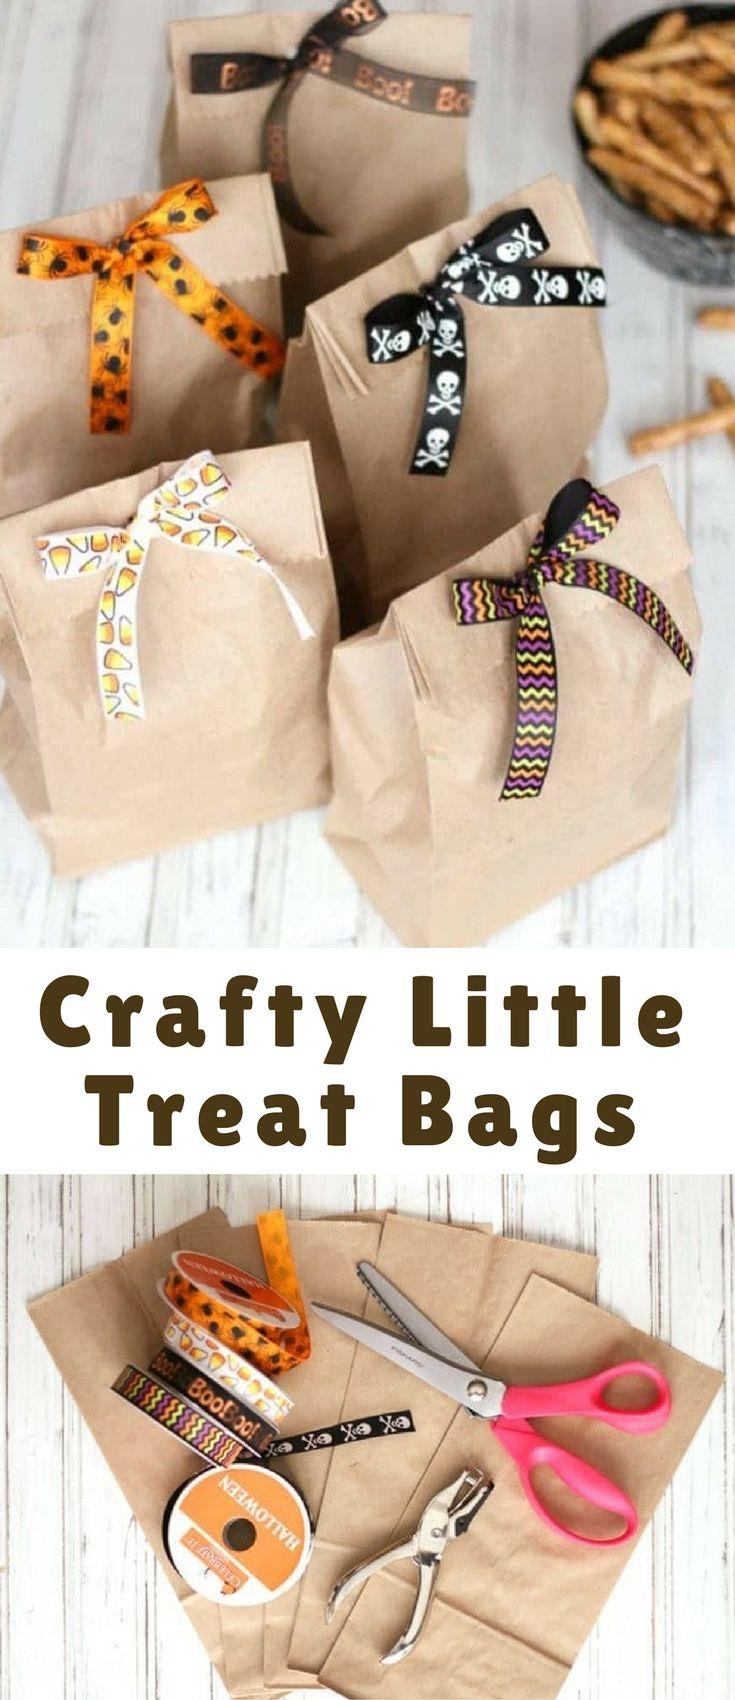 Crafty Little Treat Bags Halloween treat bags diy